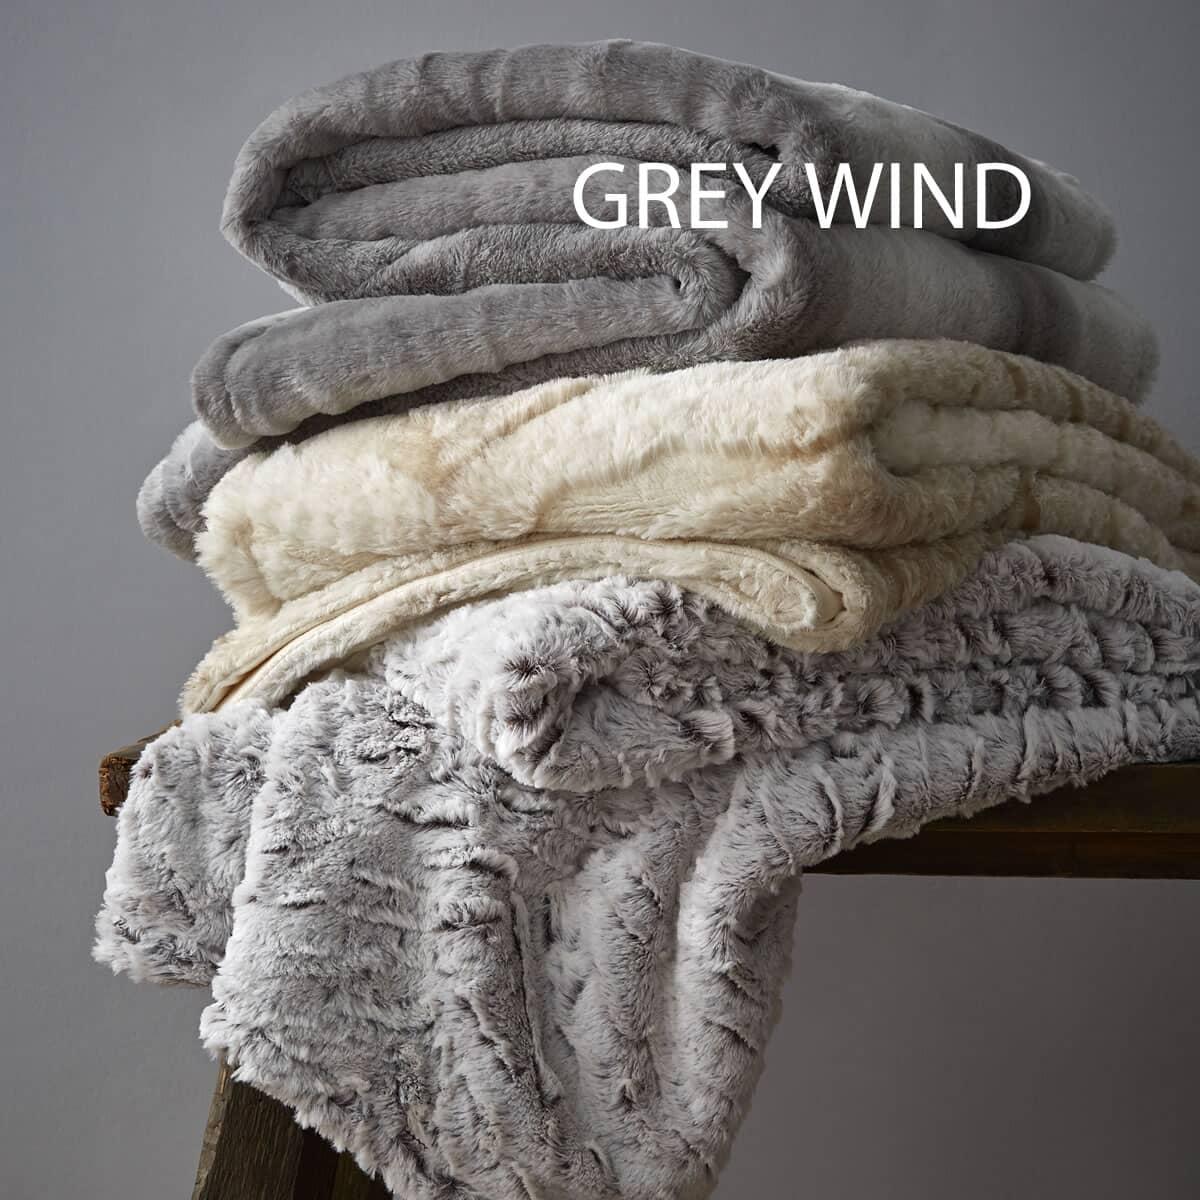 Grey Wind